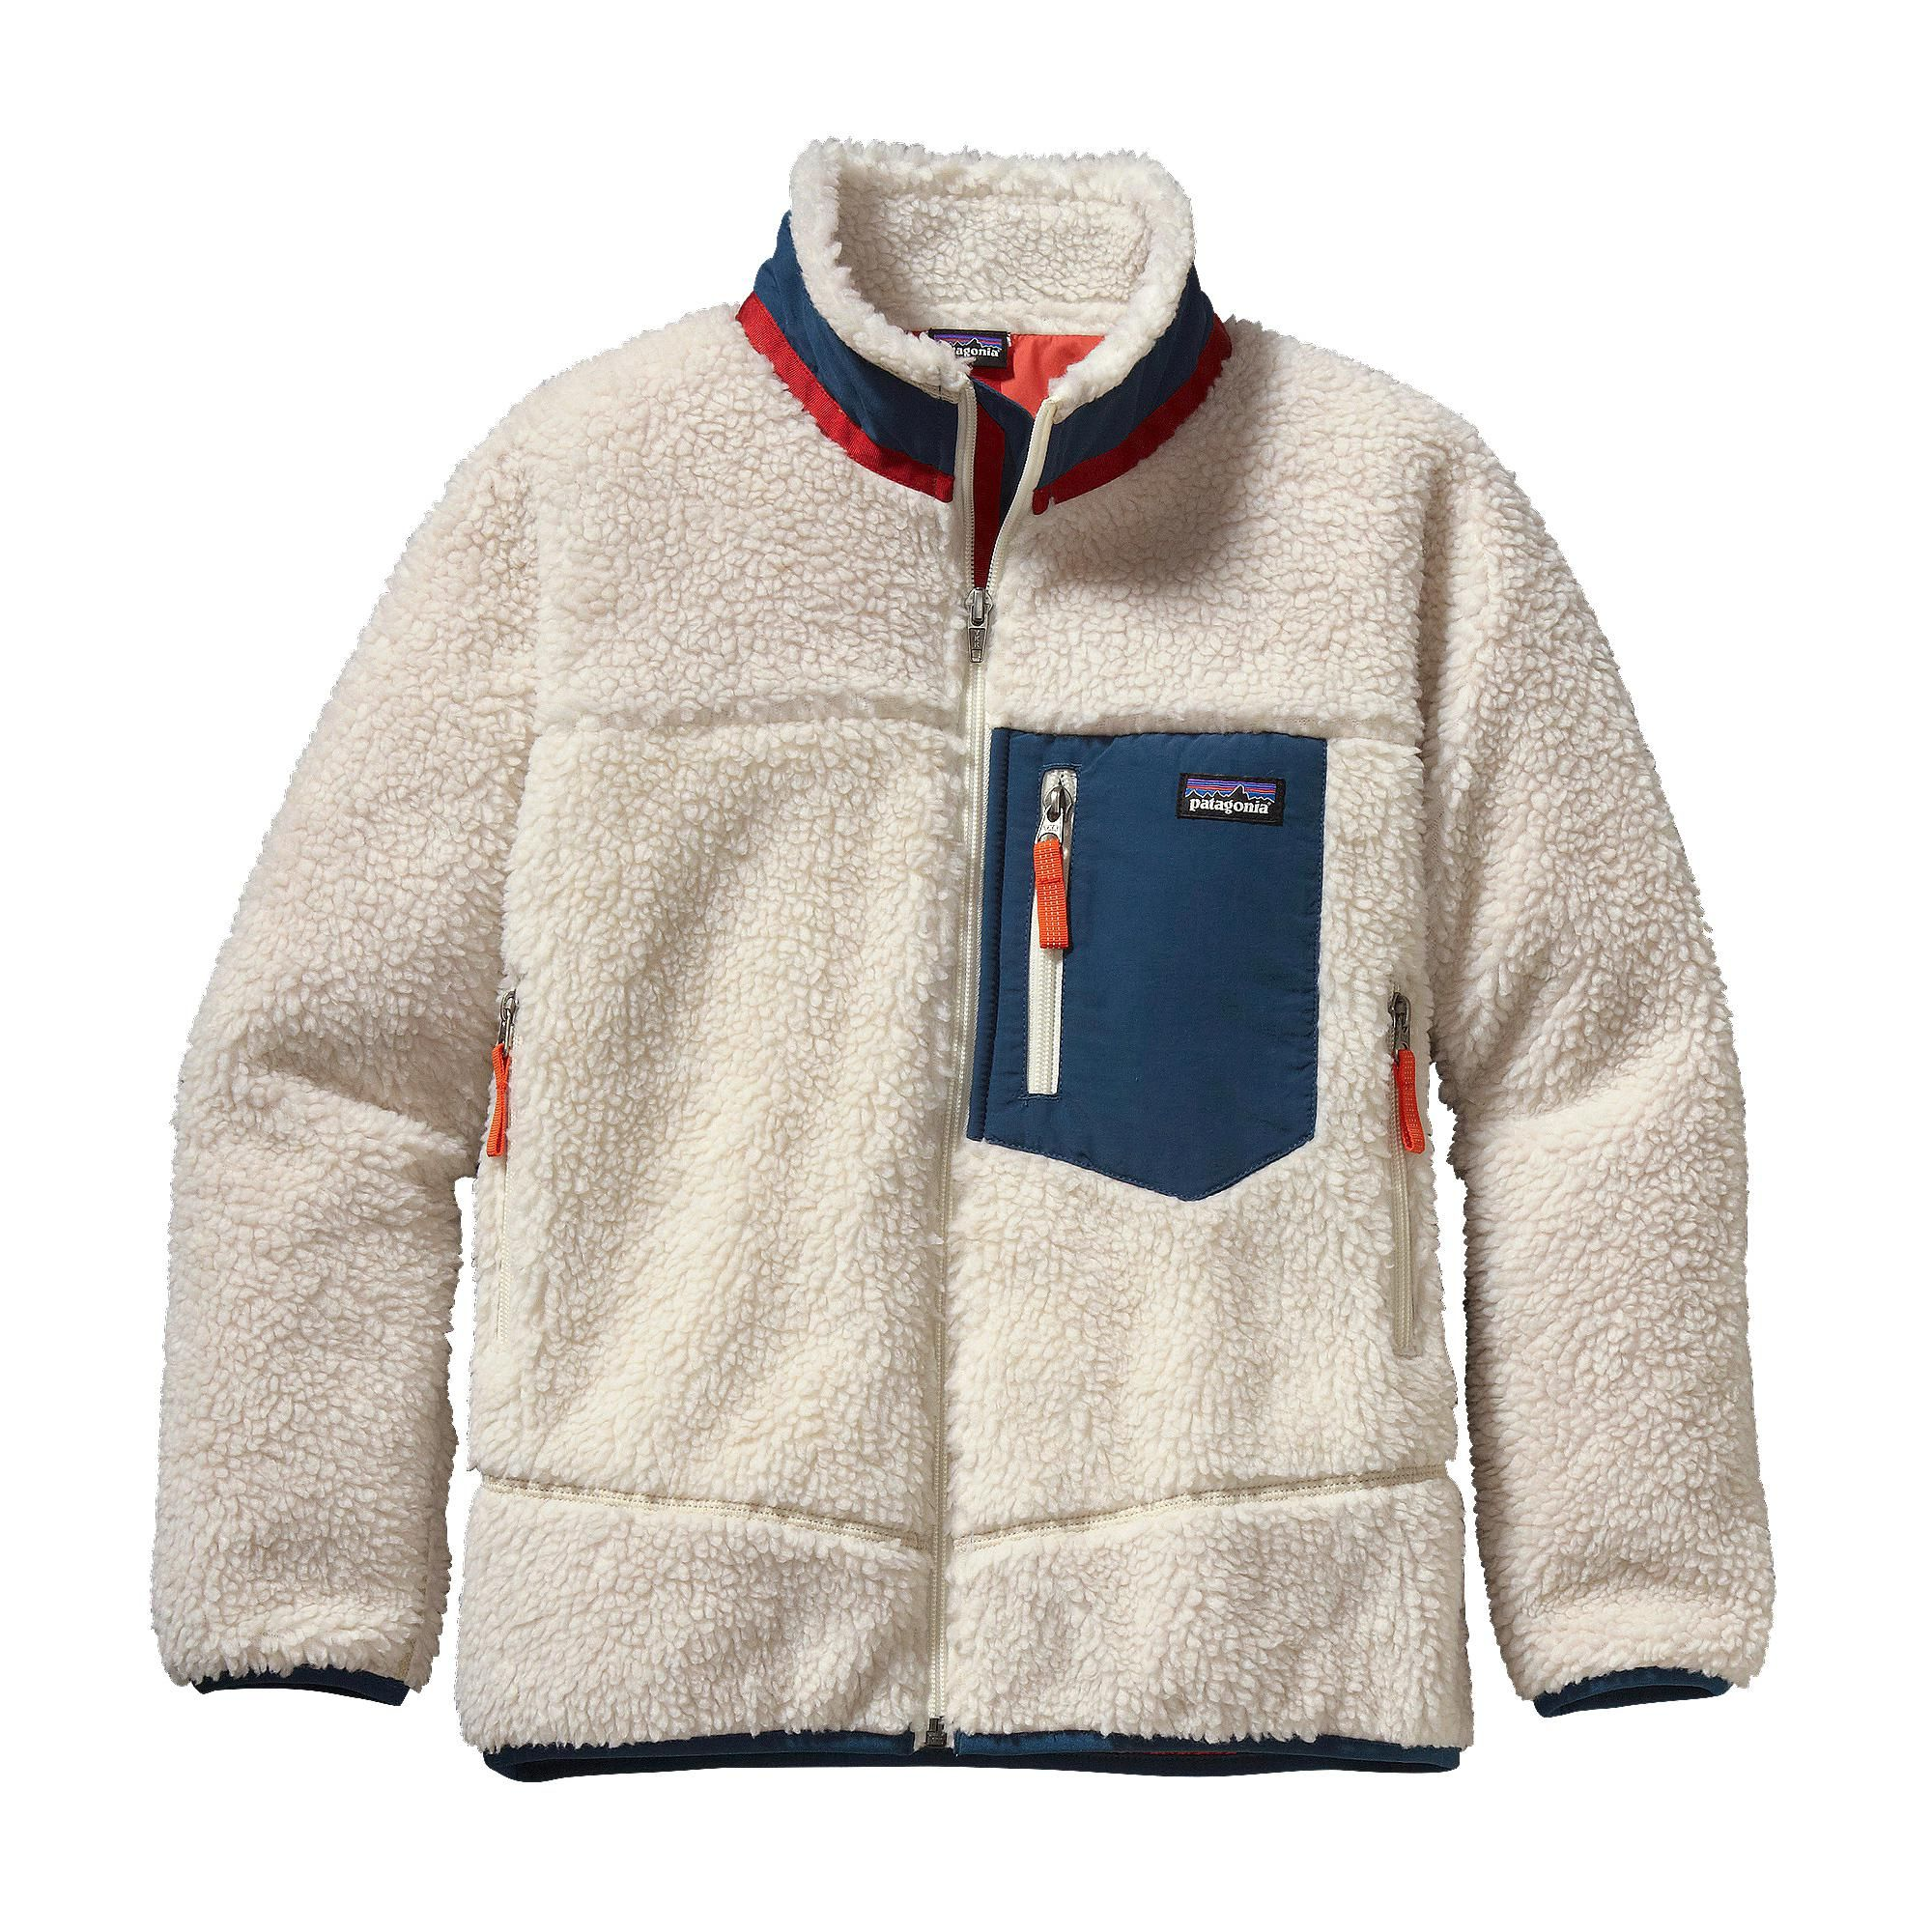 Kids' Retro-X® Fleece Jacket | christmas | Patagonia kids ...